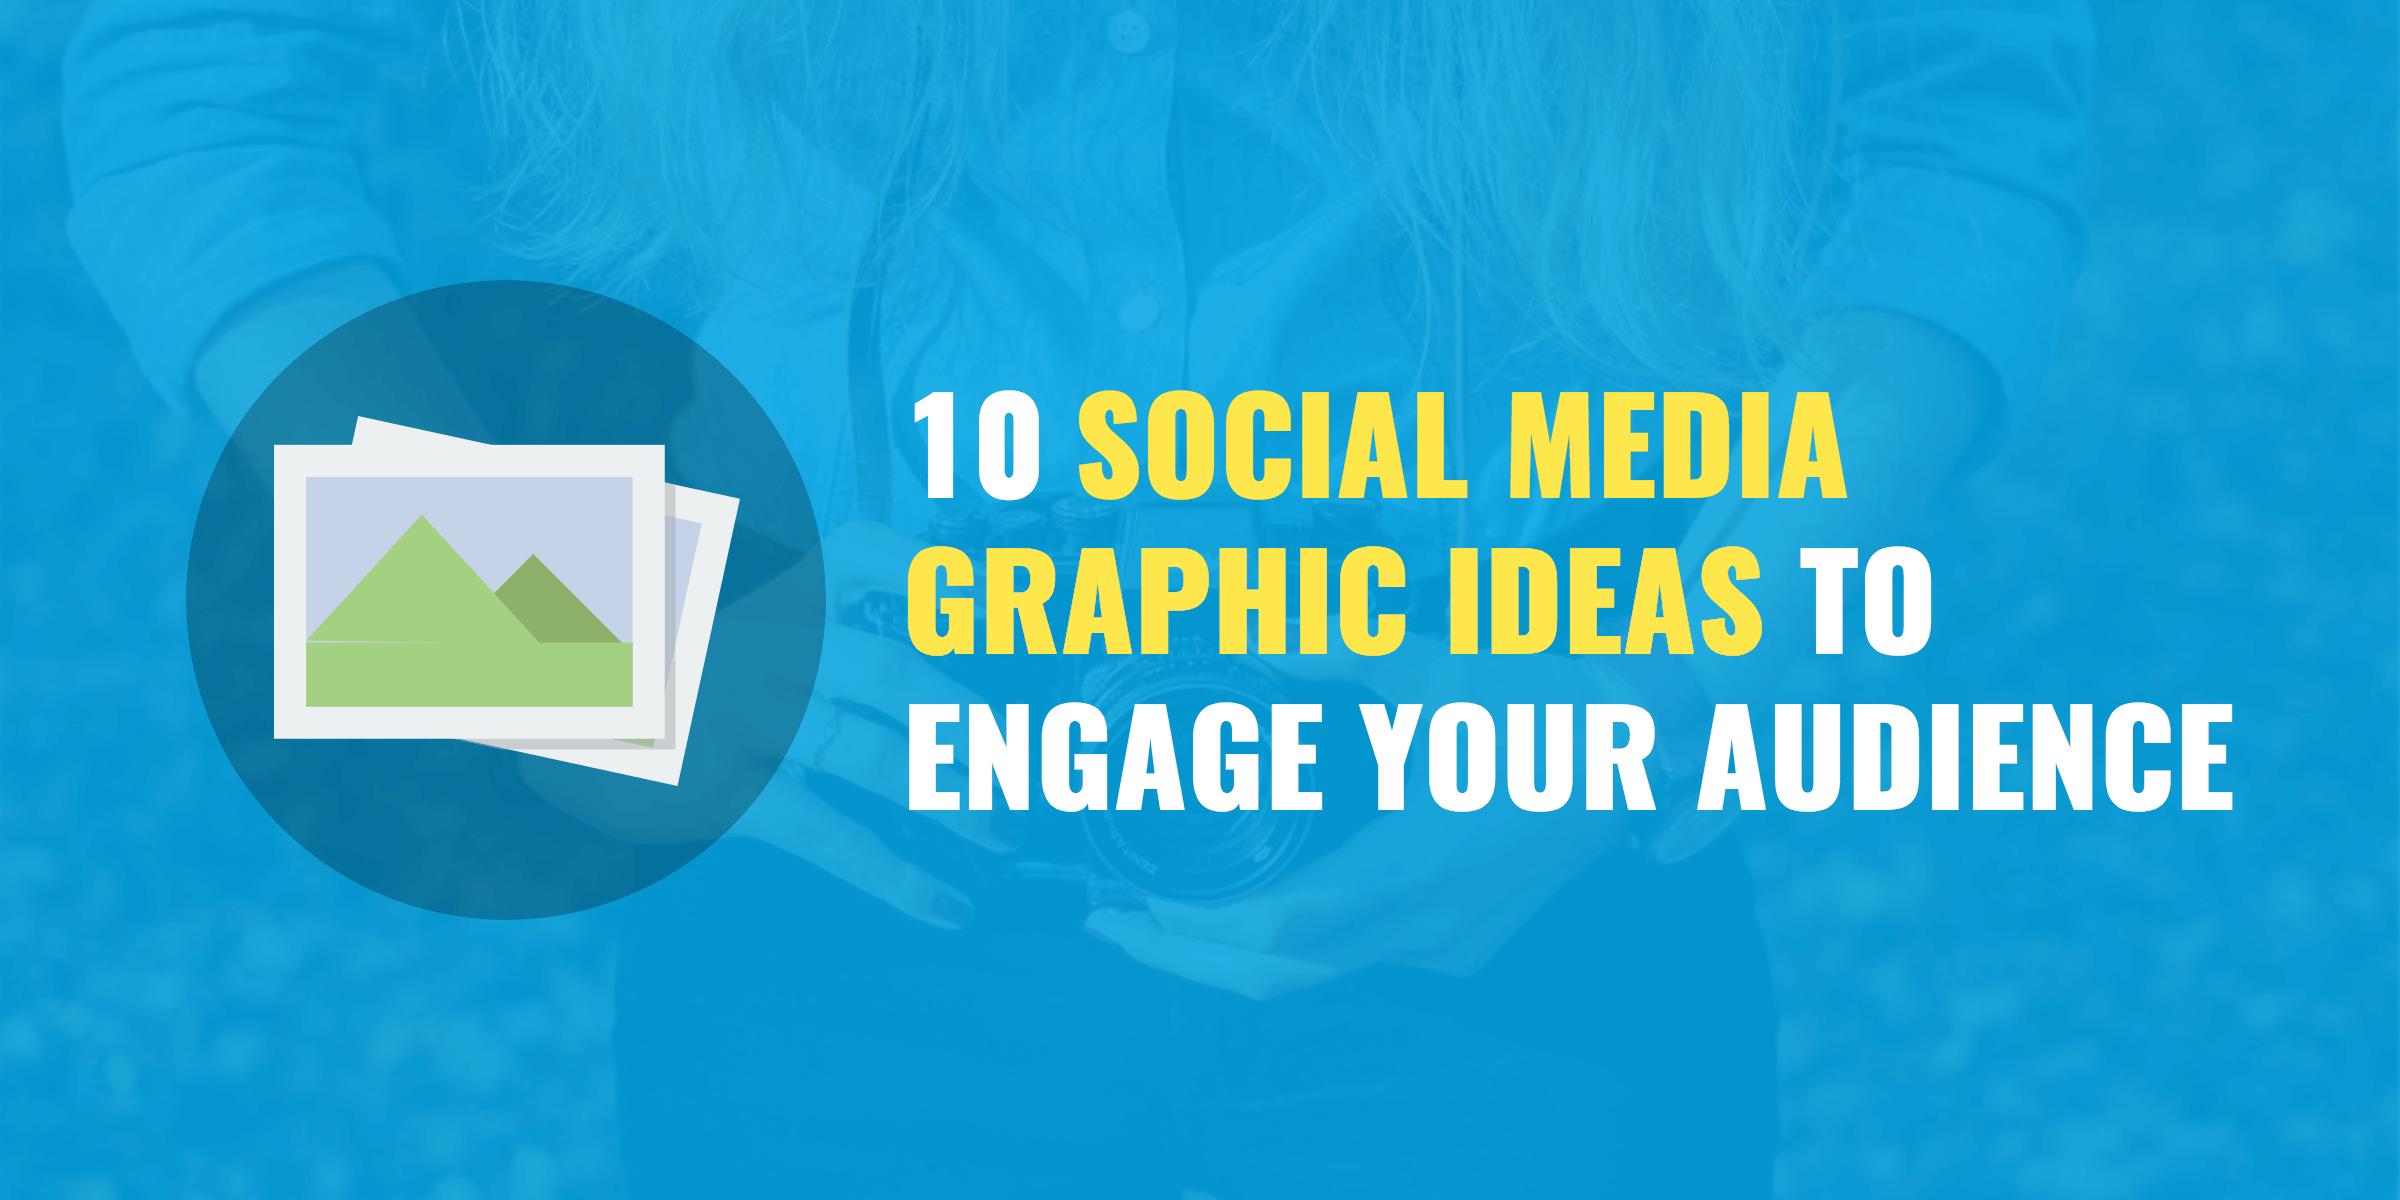 social media graphic ideas